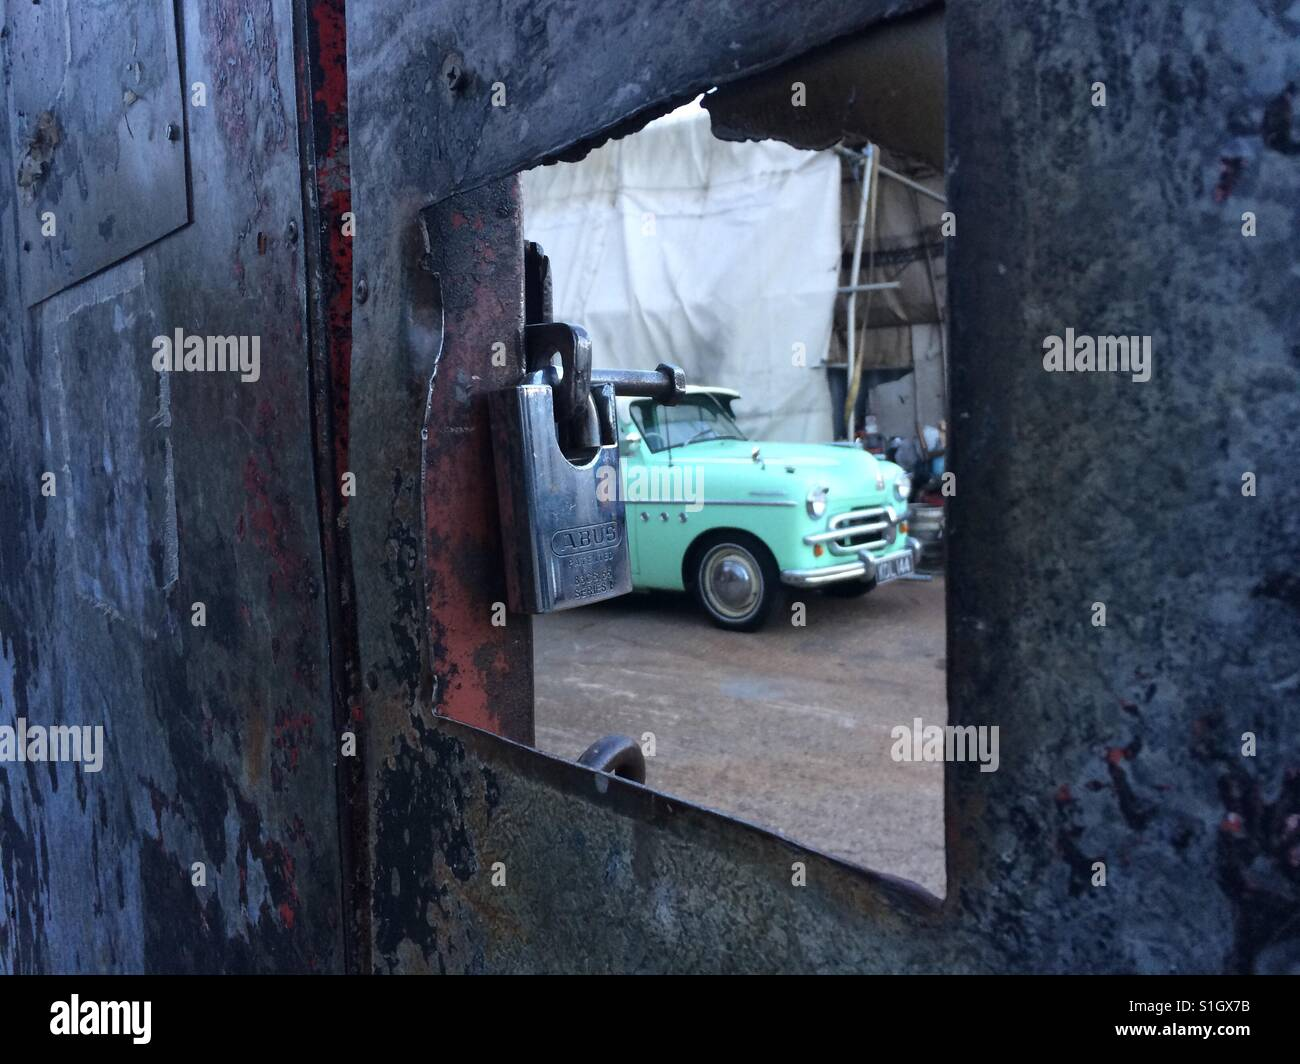 Vintage car in junk yard Stock Photo, Royalty Free Image: 310773103 ...